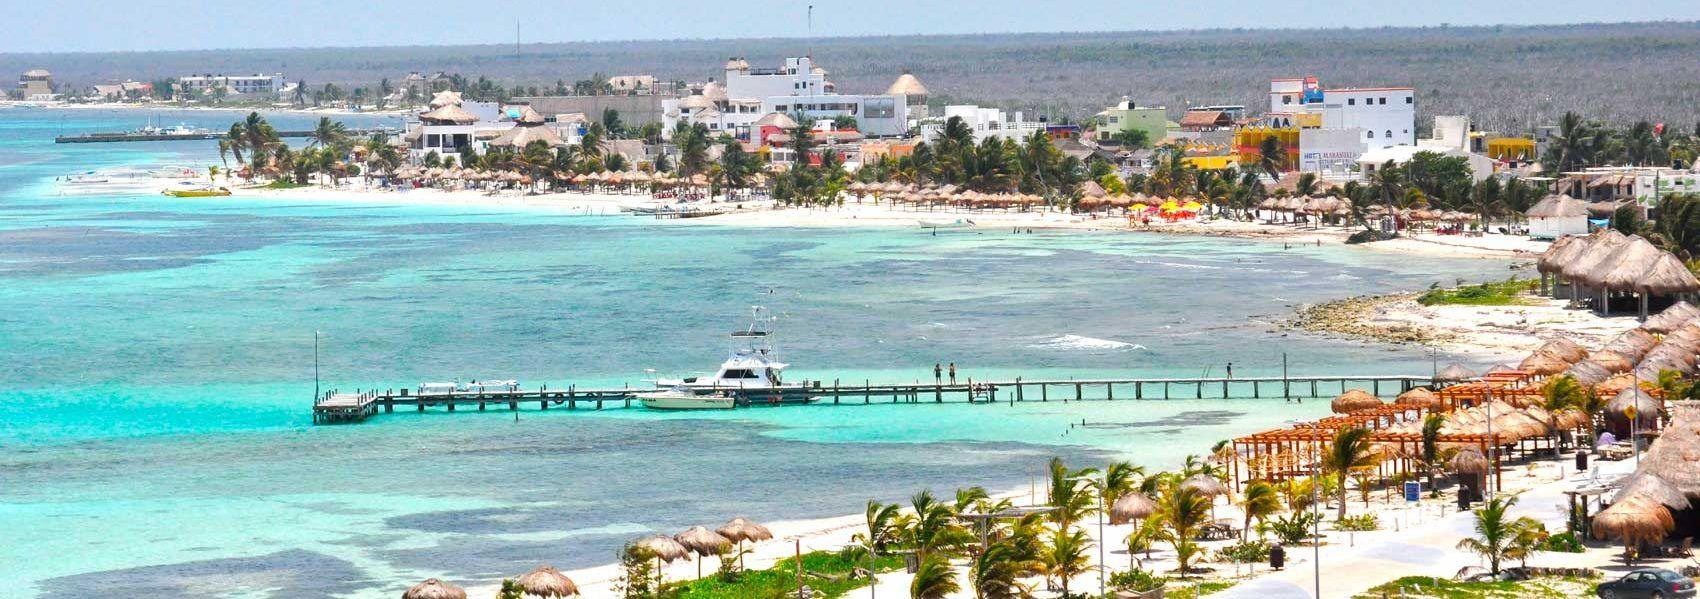 Great Costa Maya